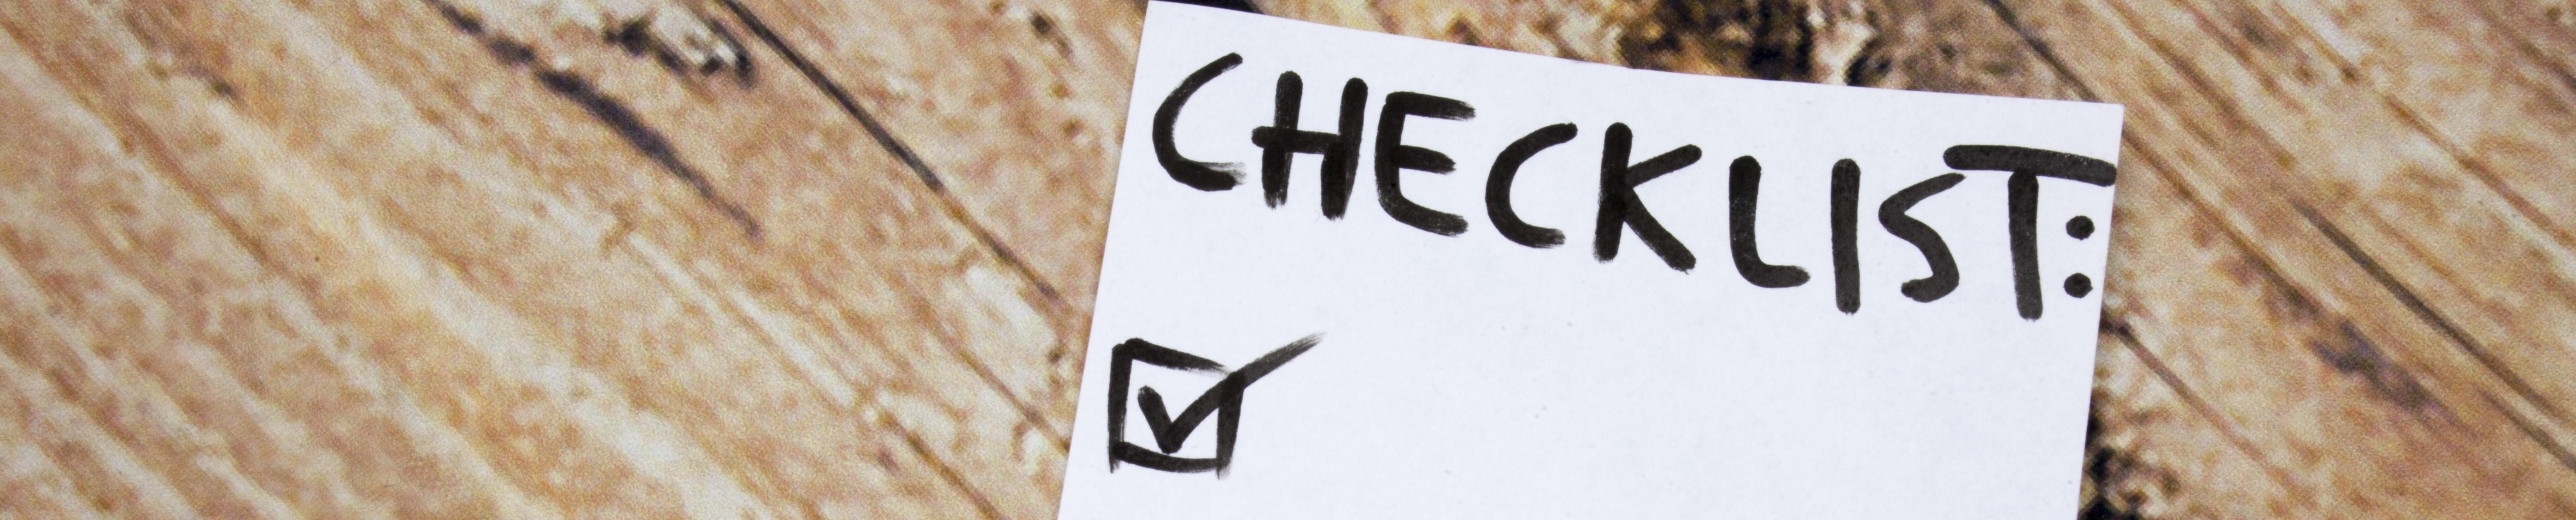 Customer Tip: Create a Daily Key Control System Checklist